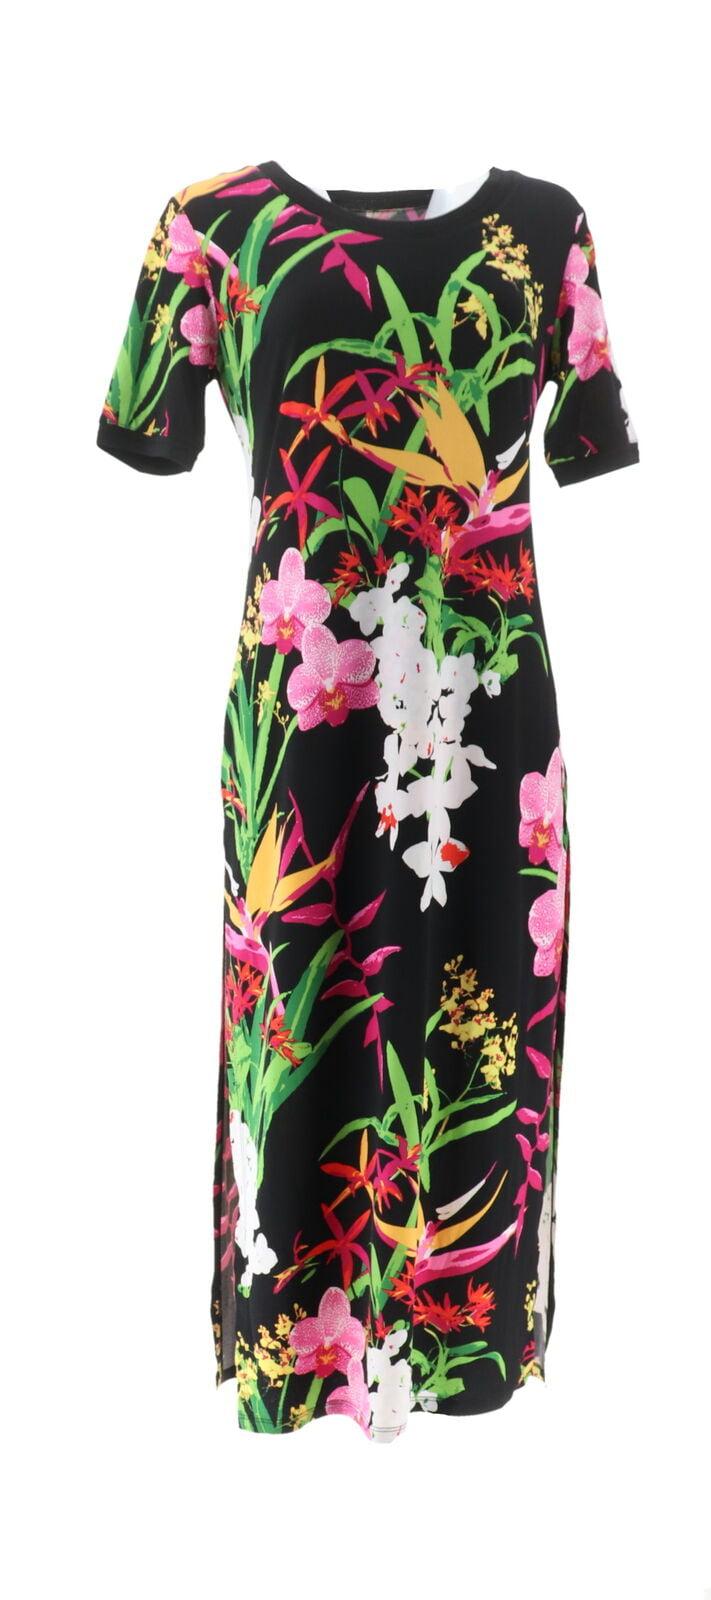 GILI Petite Short-Sleeve Side Slit Maxi Dress Black PM NEW A304669